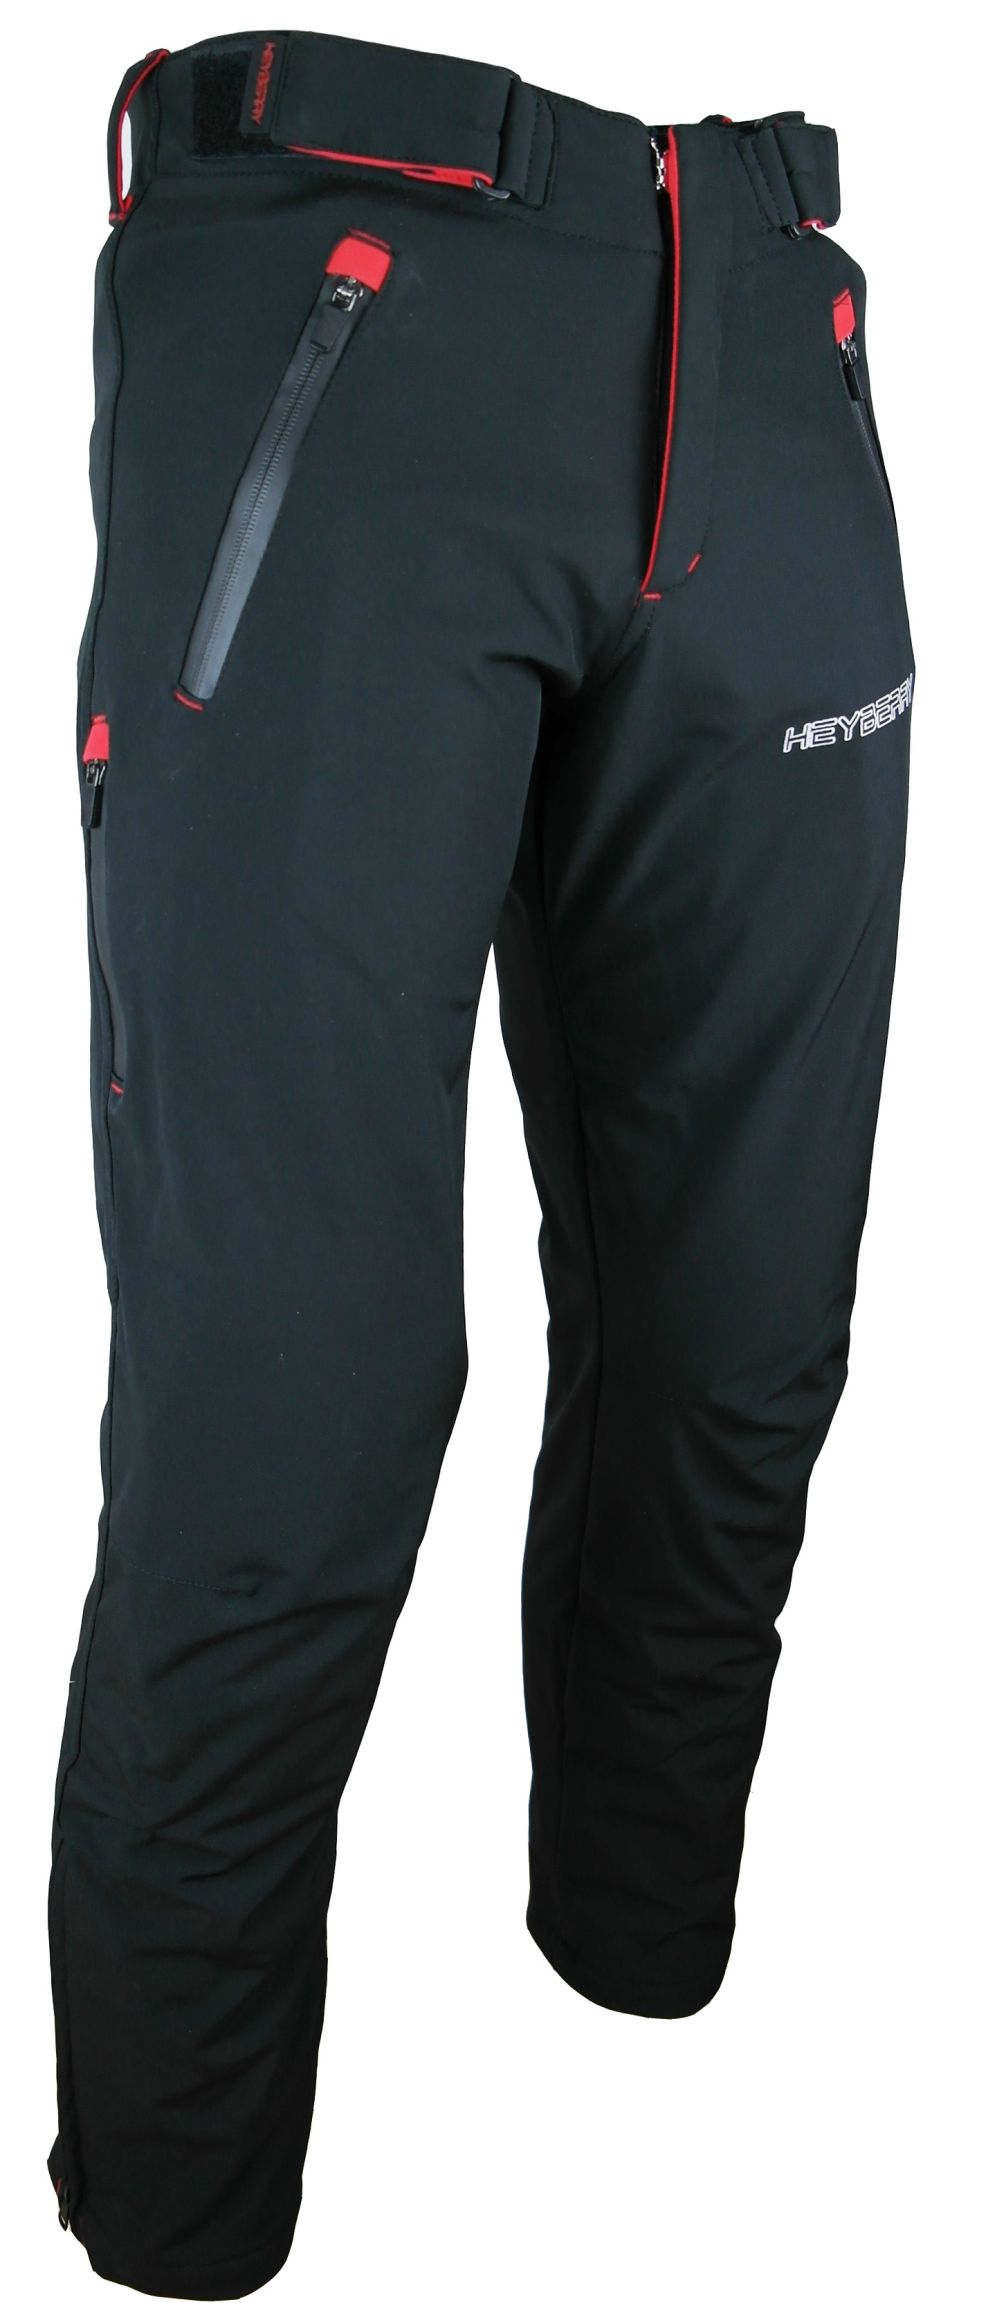 Heyberry Soft Shell Motorradhose Textil Schwarz / Rot Gr. M L XL XXL 3XL